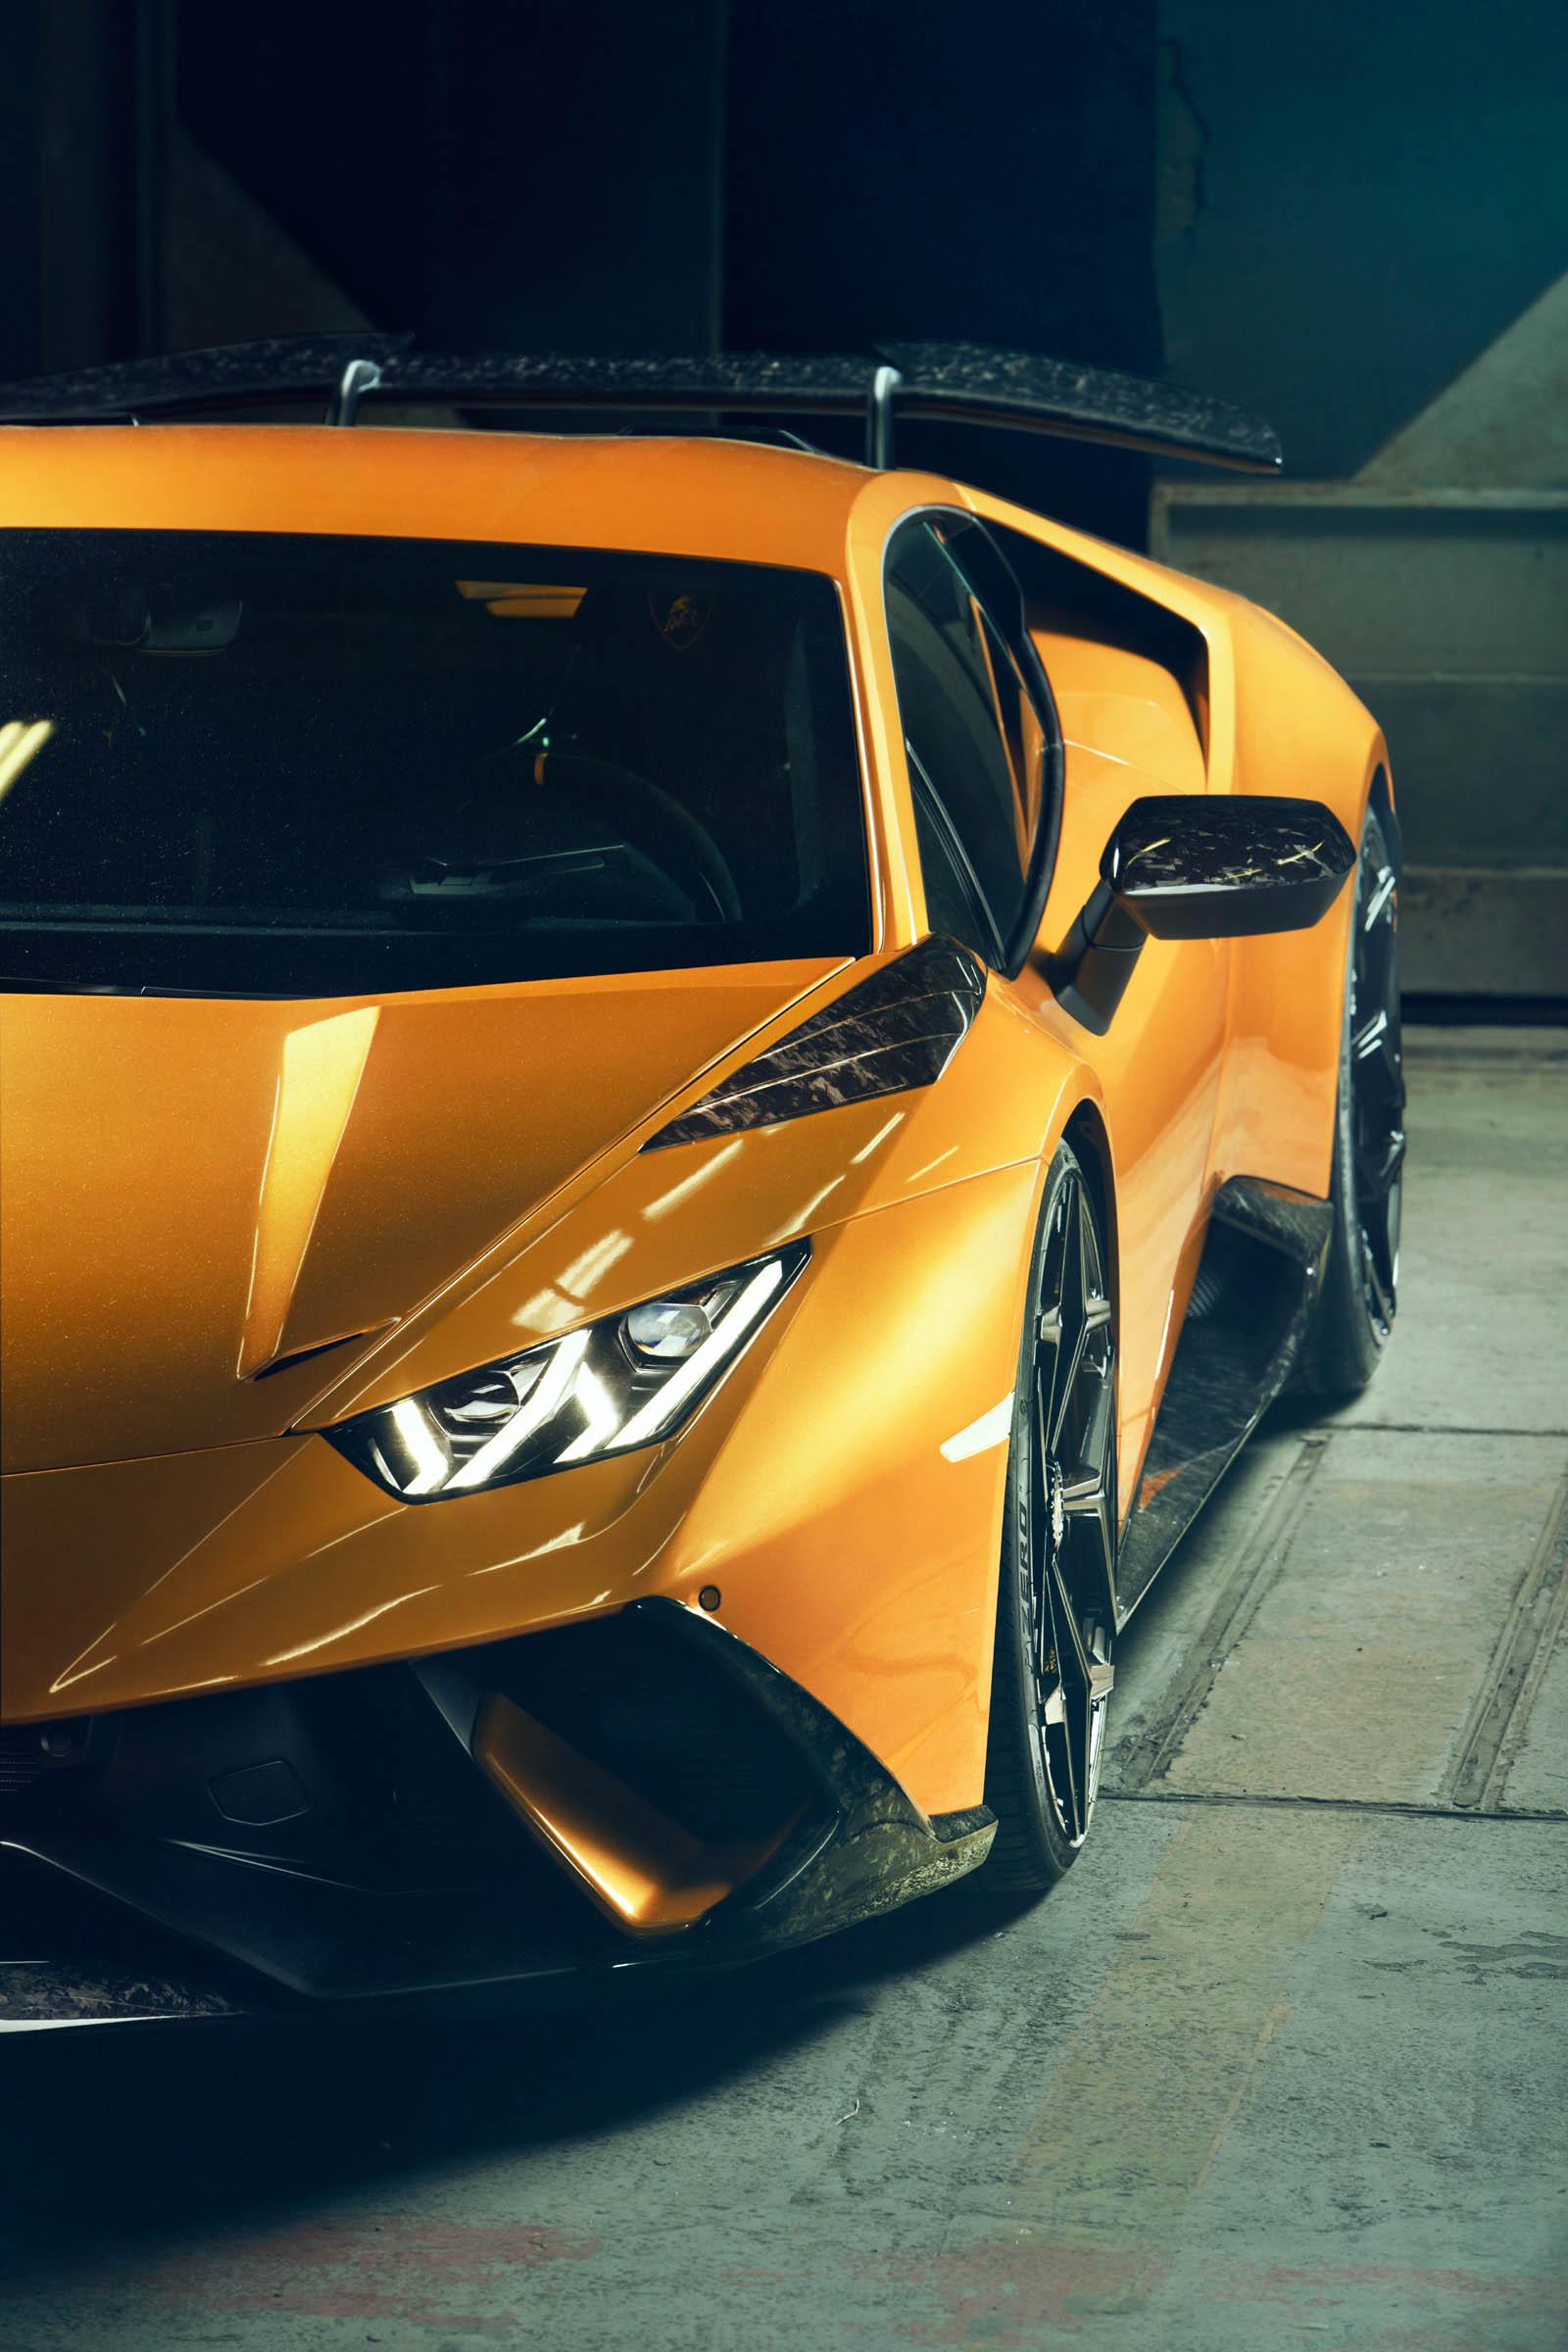 2018 Novitec Lamborghini Huracan Performante Headlight Wallpaper 13